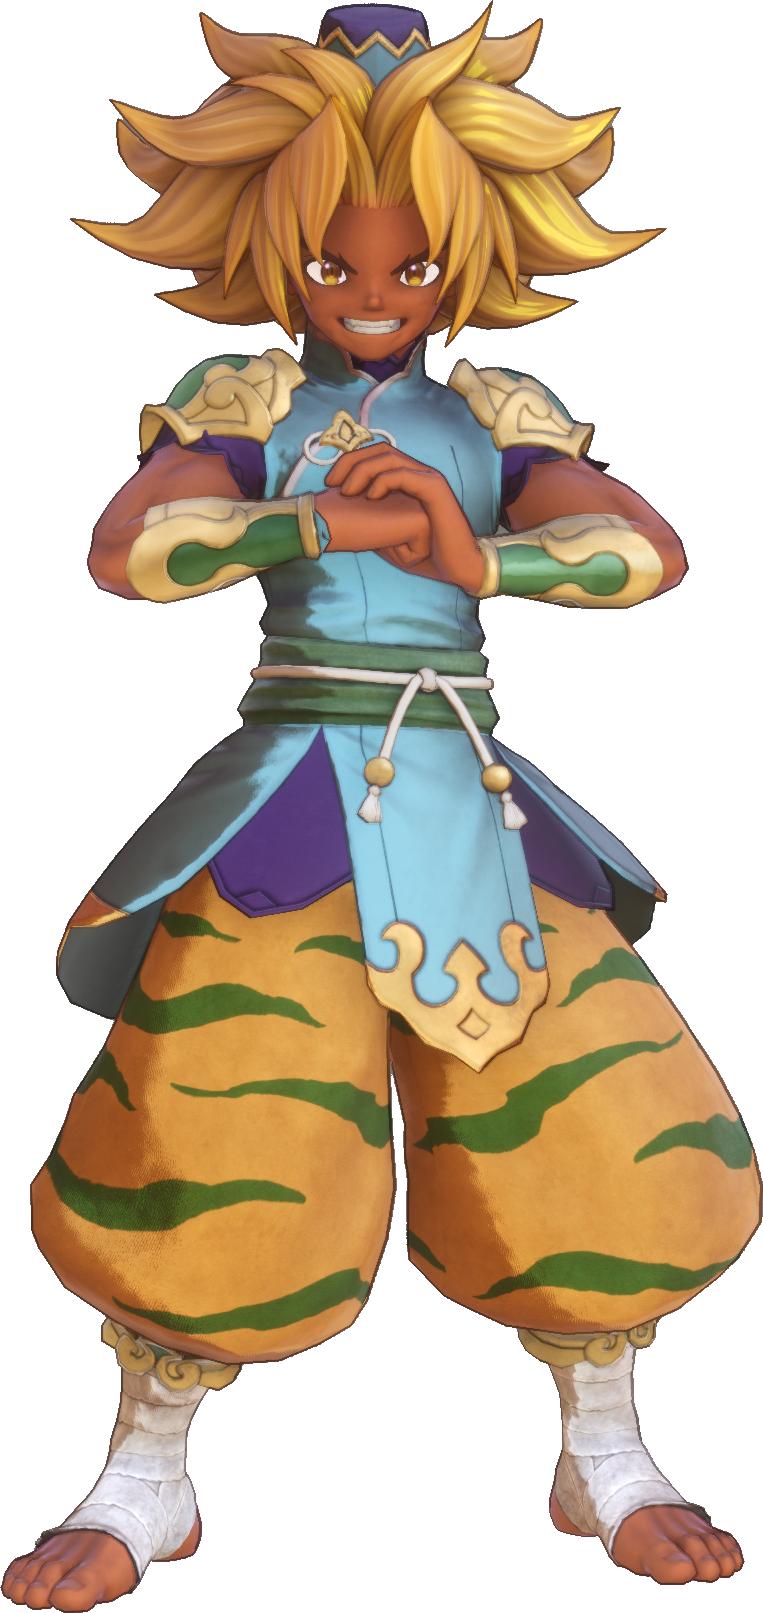 Warrior Monk (Trials of Mana)